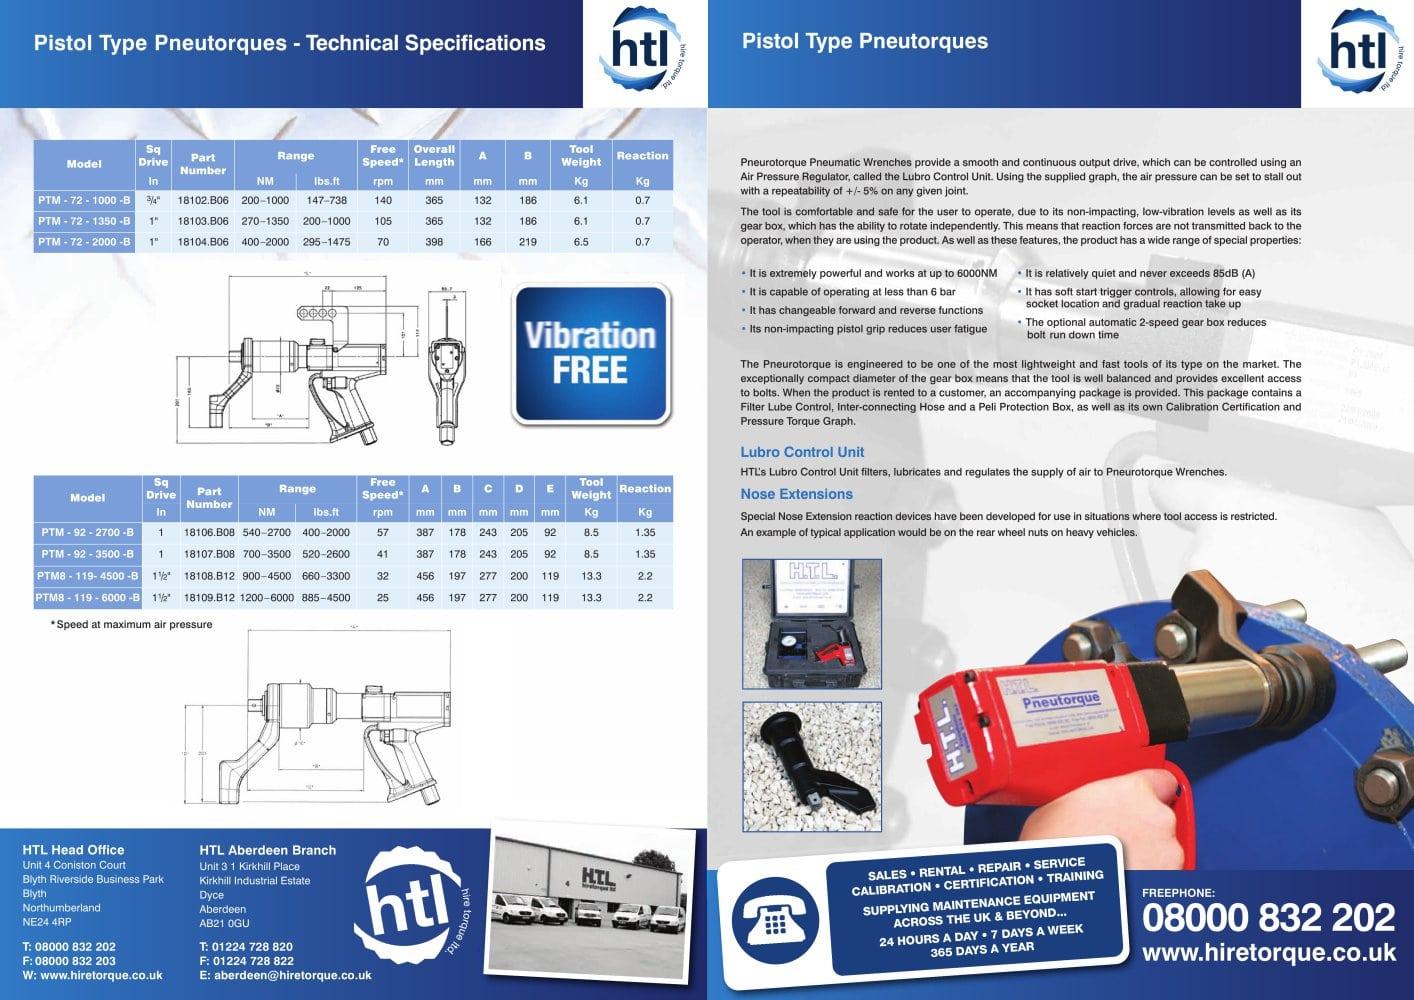 Pistol Grip Range Htl Hire Torque Ltd Pdf Catalogue